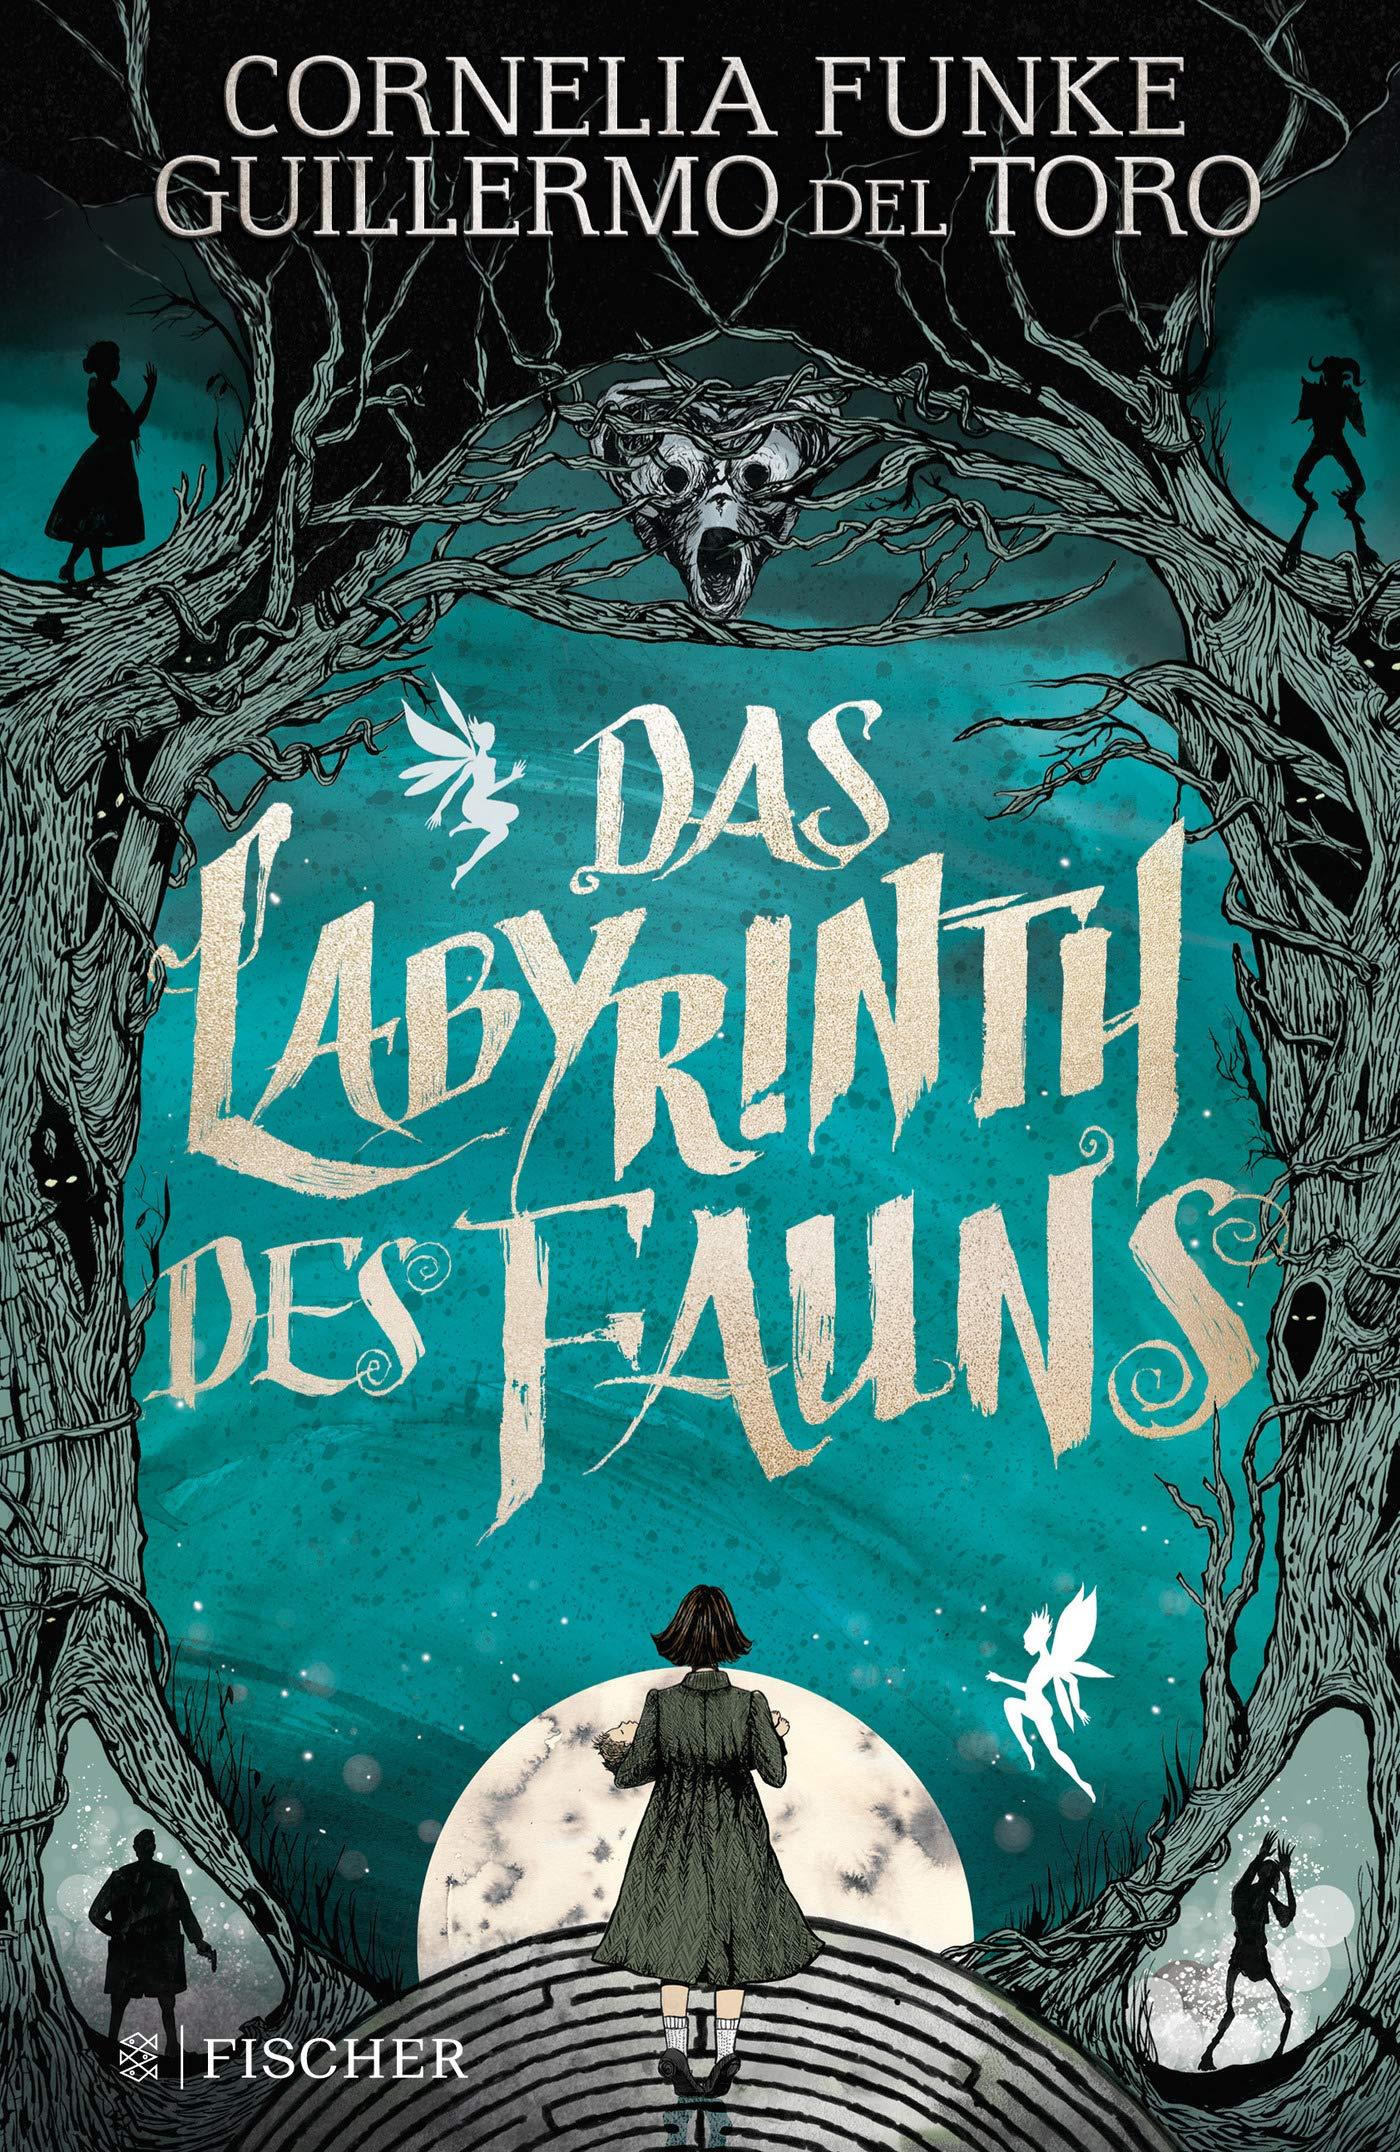 Das Labyrinth des Fauns: Amazon.de: Cornelia Funke, Guillermo del Toro,  Williams, Allen, Schnettler, Tobias: Bücher